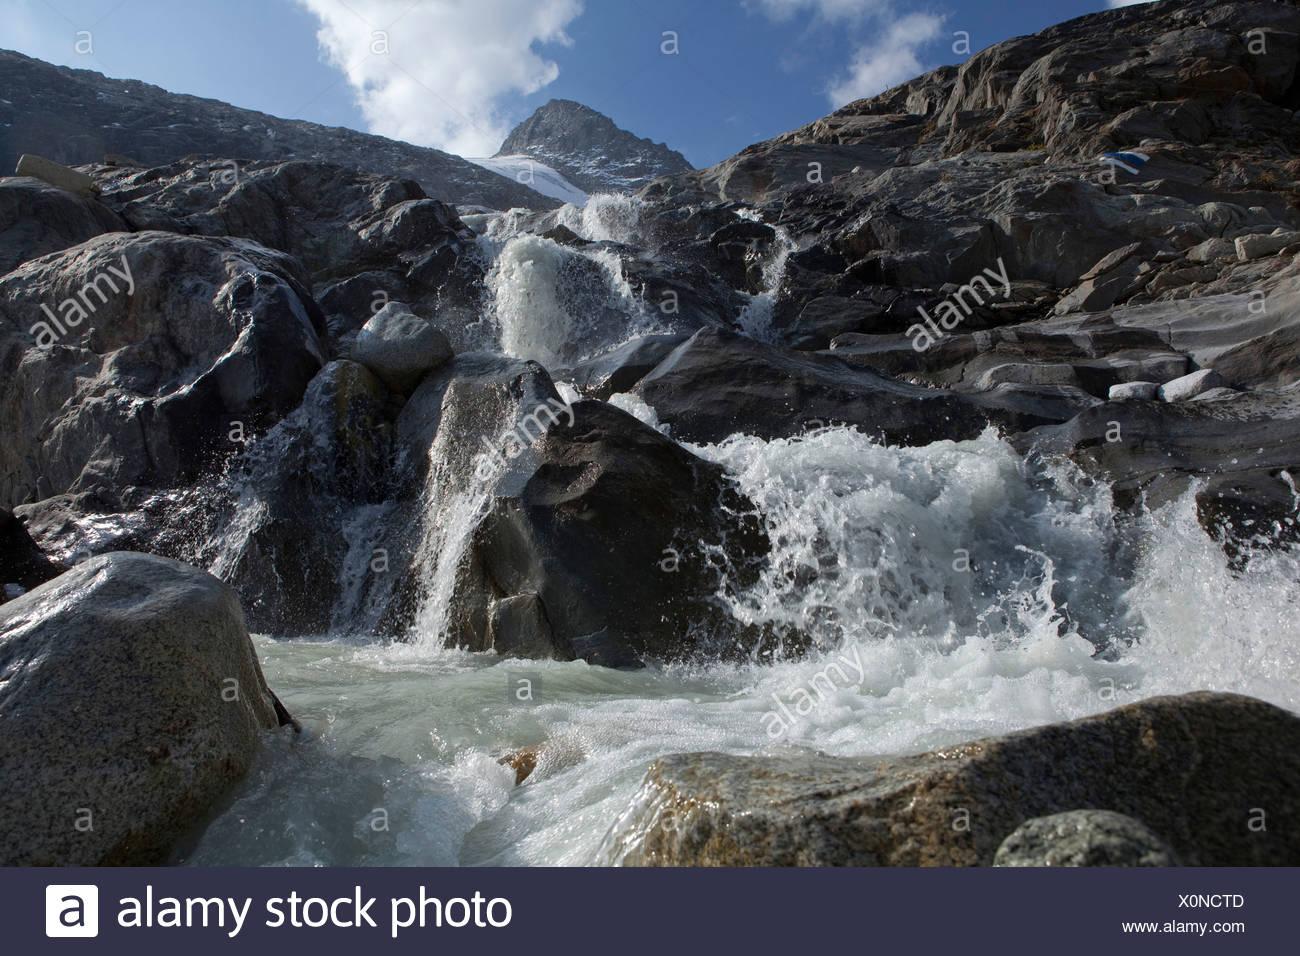 Waterfall, pit glacier, Hienderstock, Urbachtal, mountain, mountains, canton, Bern, Gauli, Gauligebiet, Gauligletscher, waterfal - Stock Image